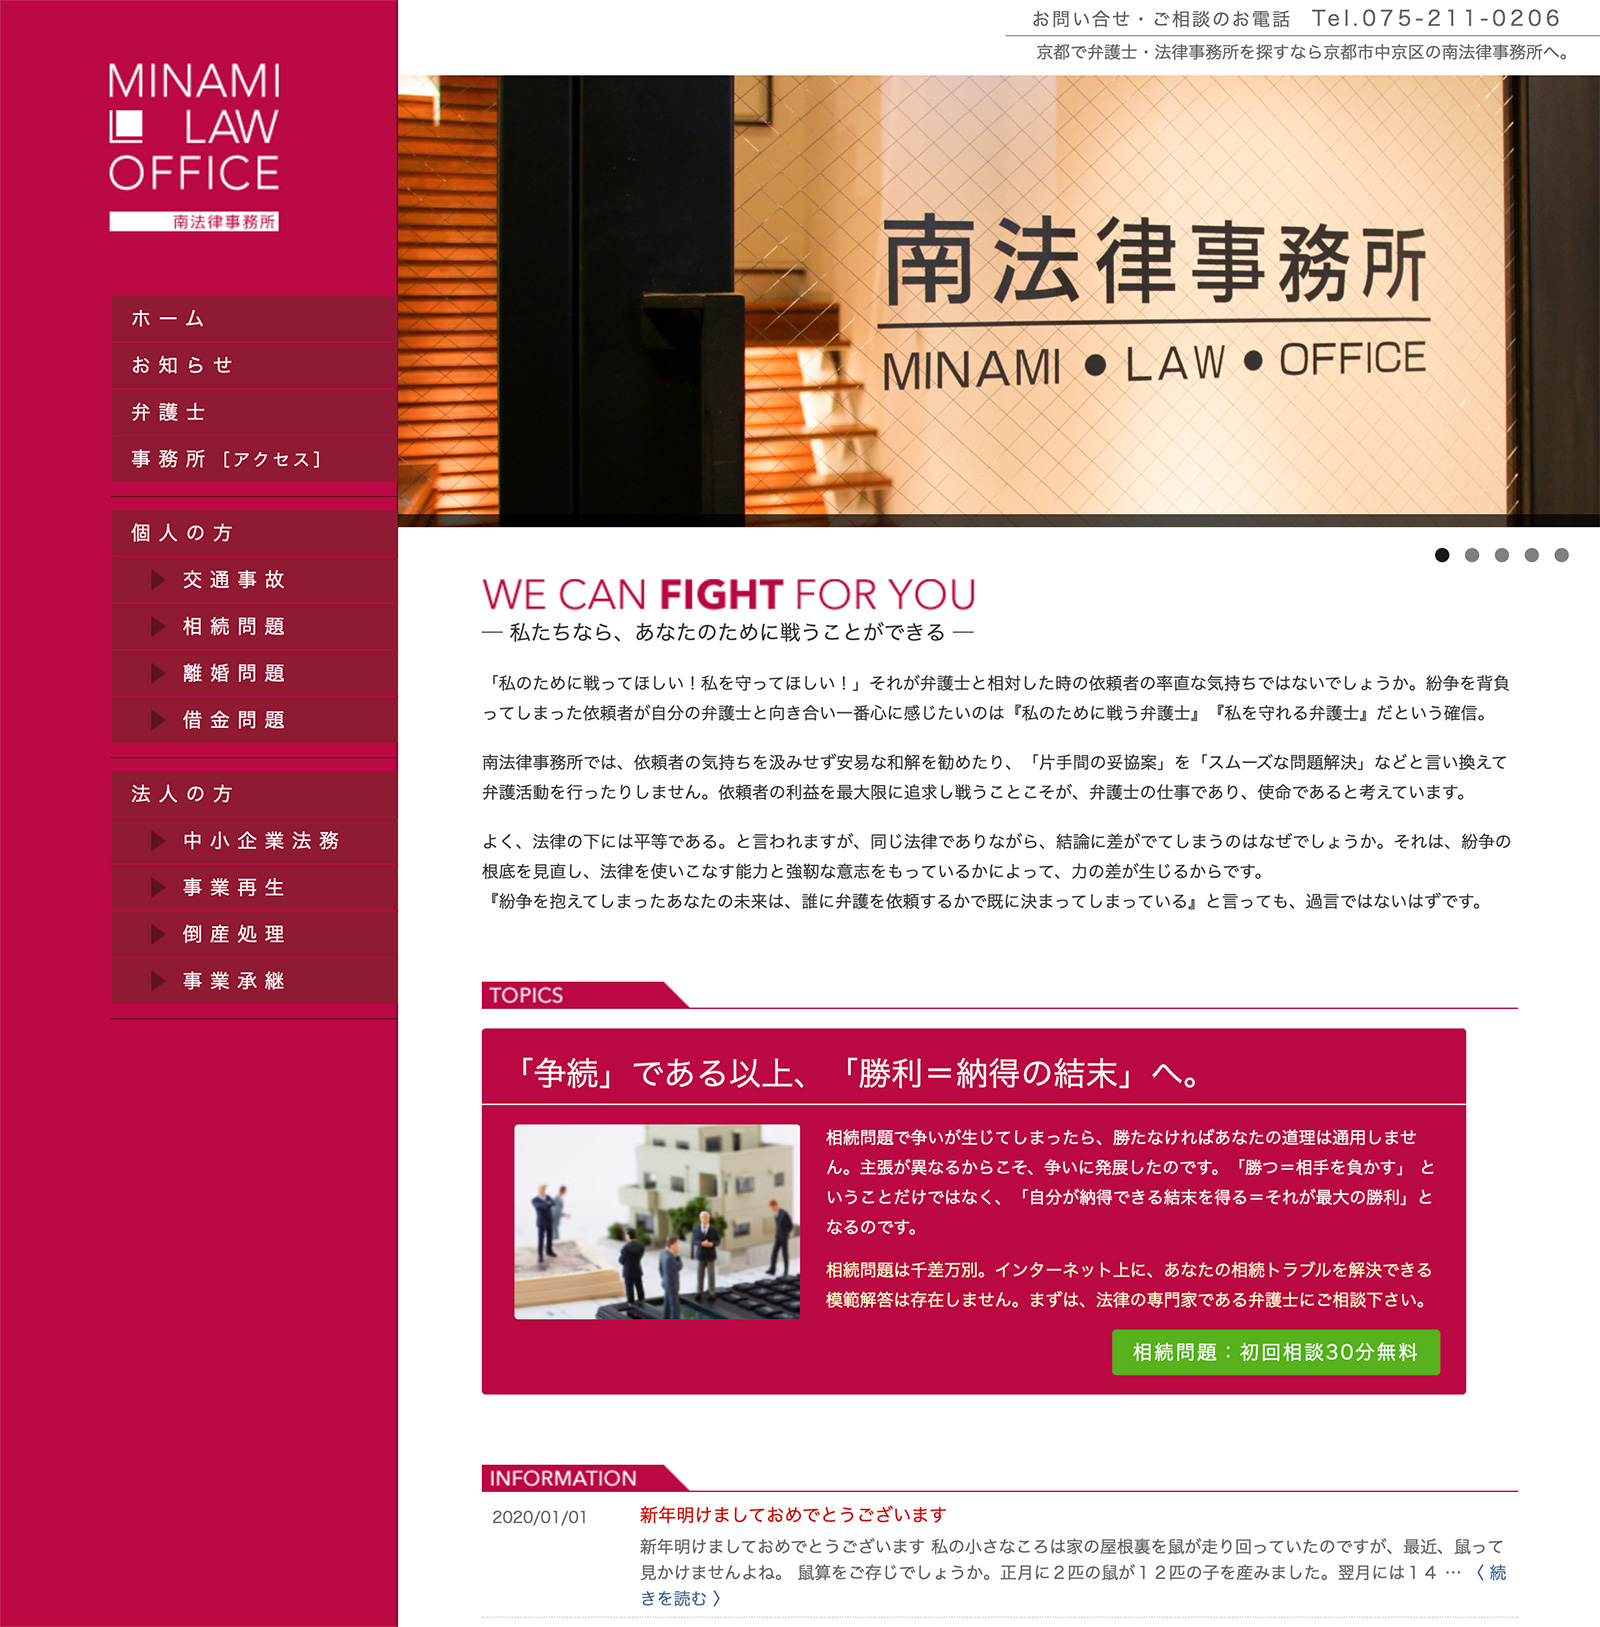 京都の南法律事務所